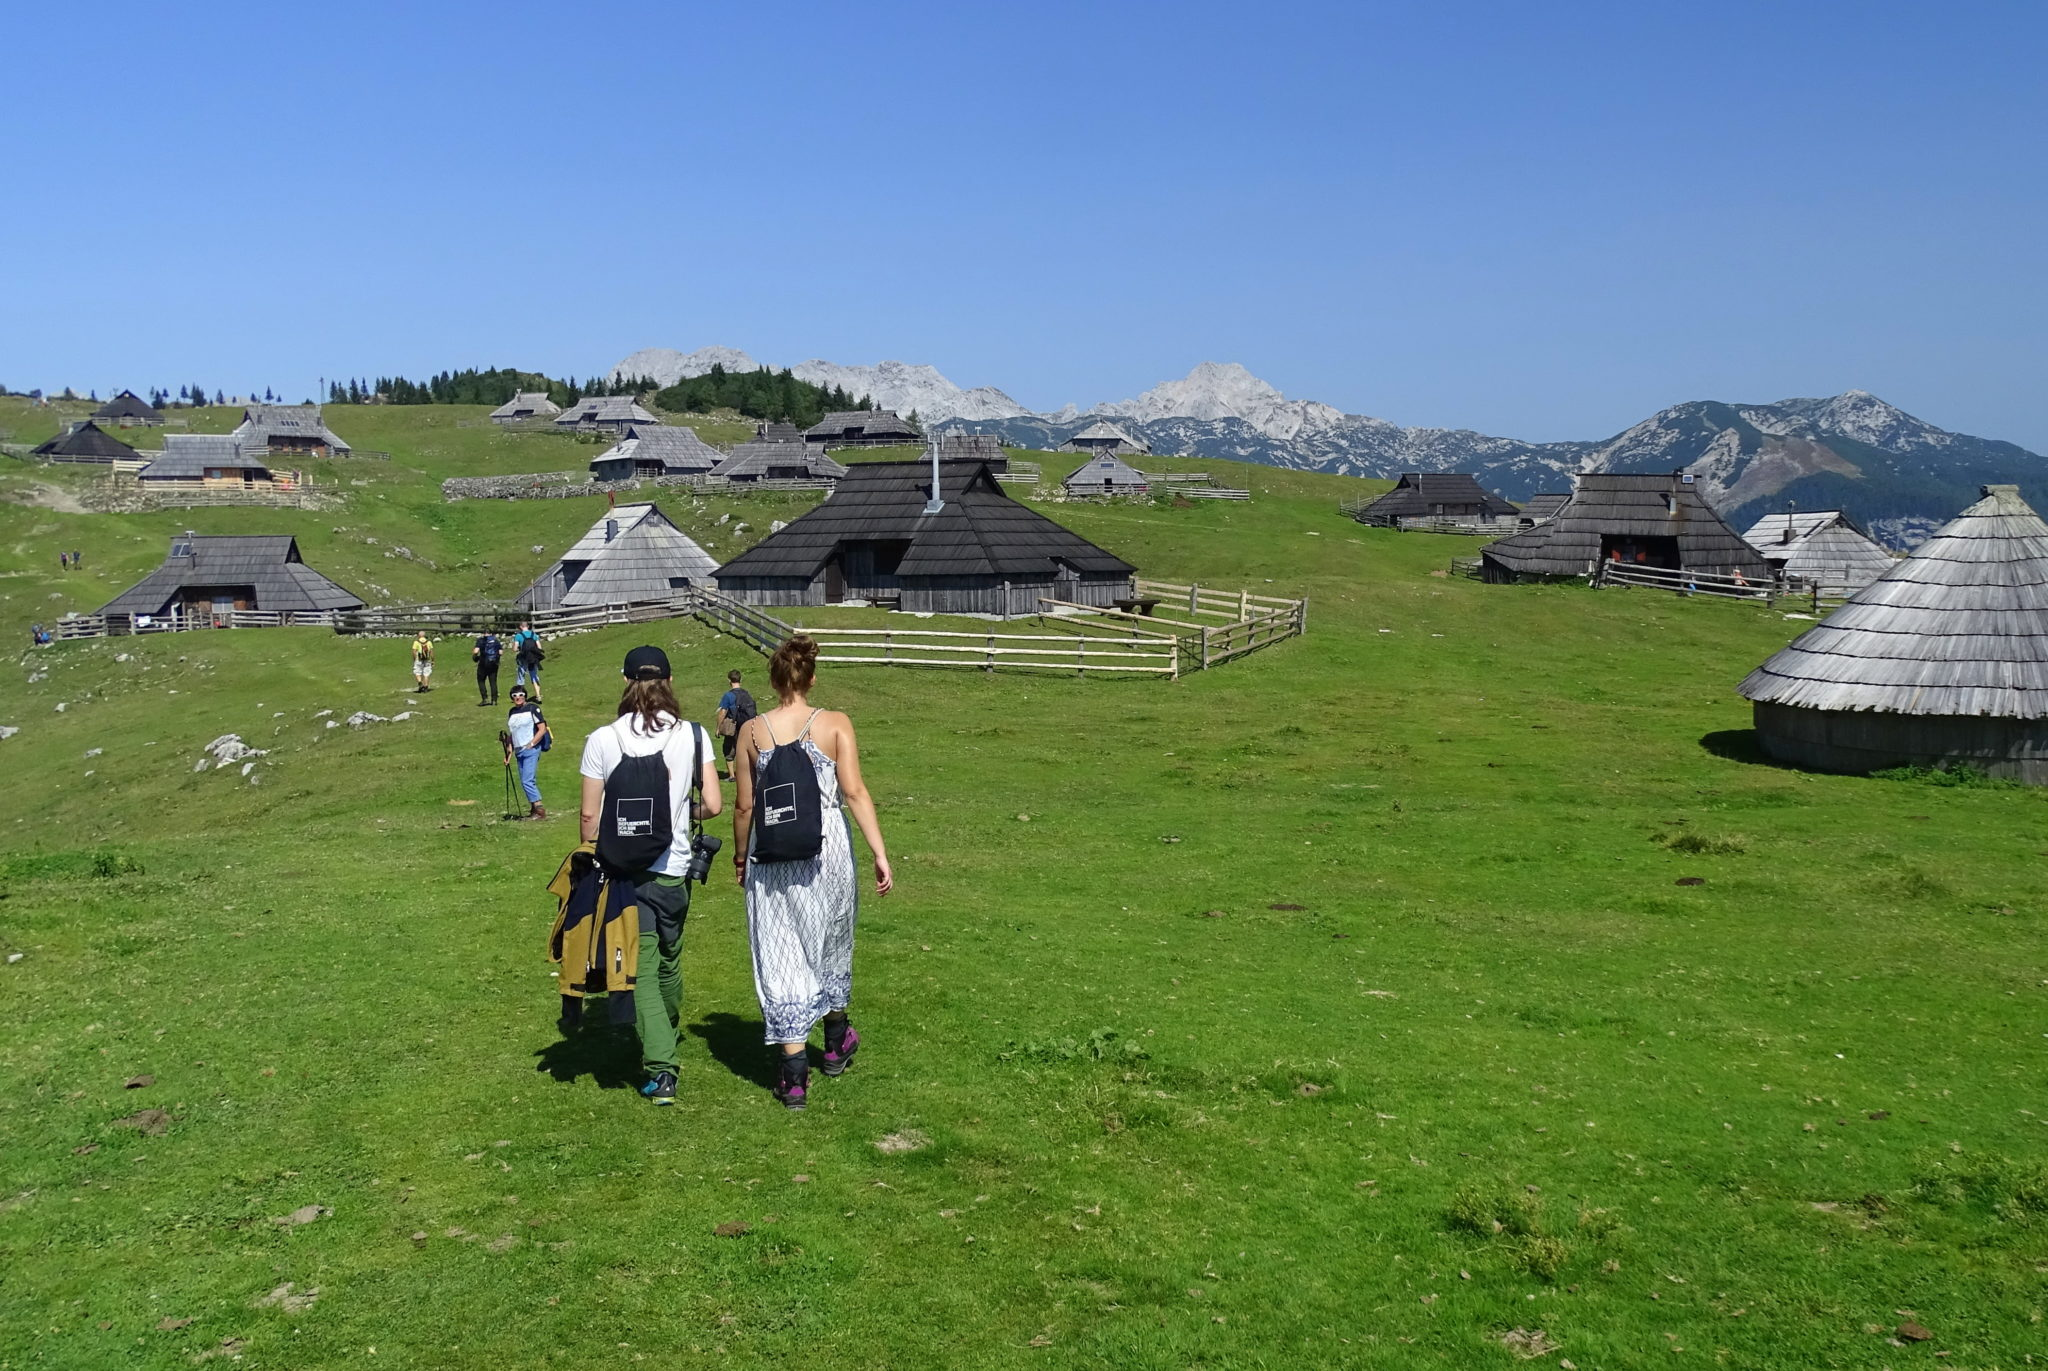 Exploring Velika Planina, InstaMeet hosted by @igslovenia and Tourism Ljubljana